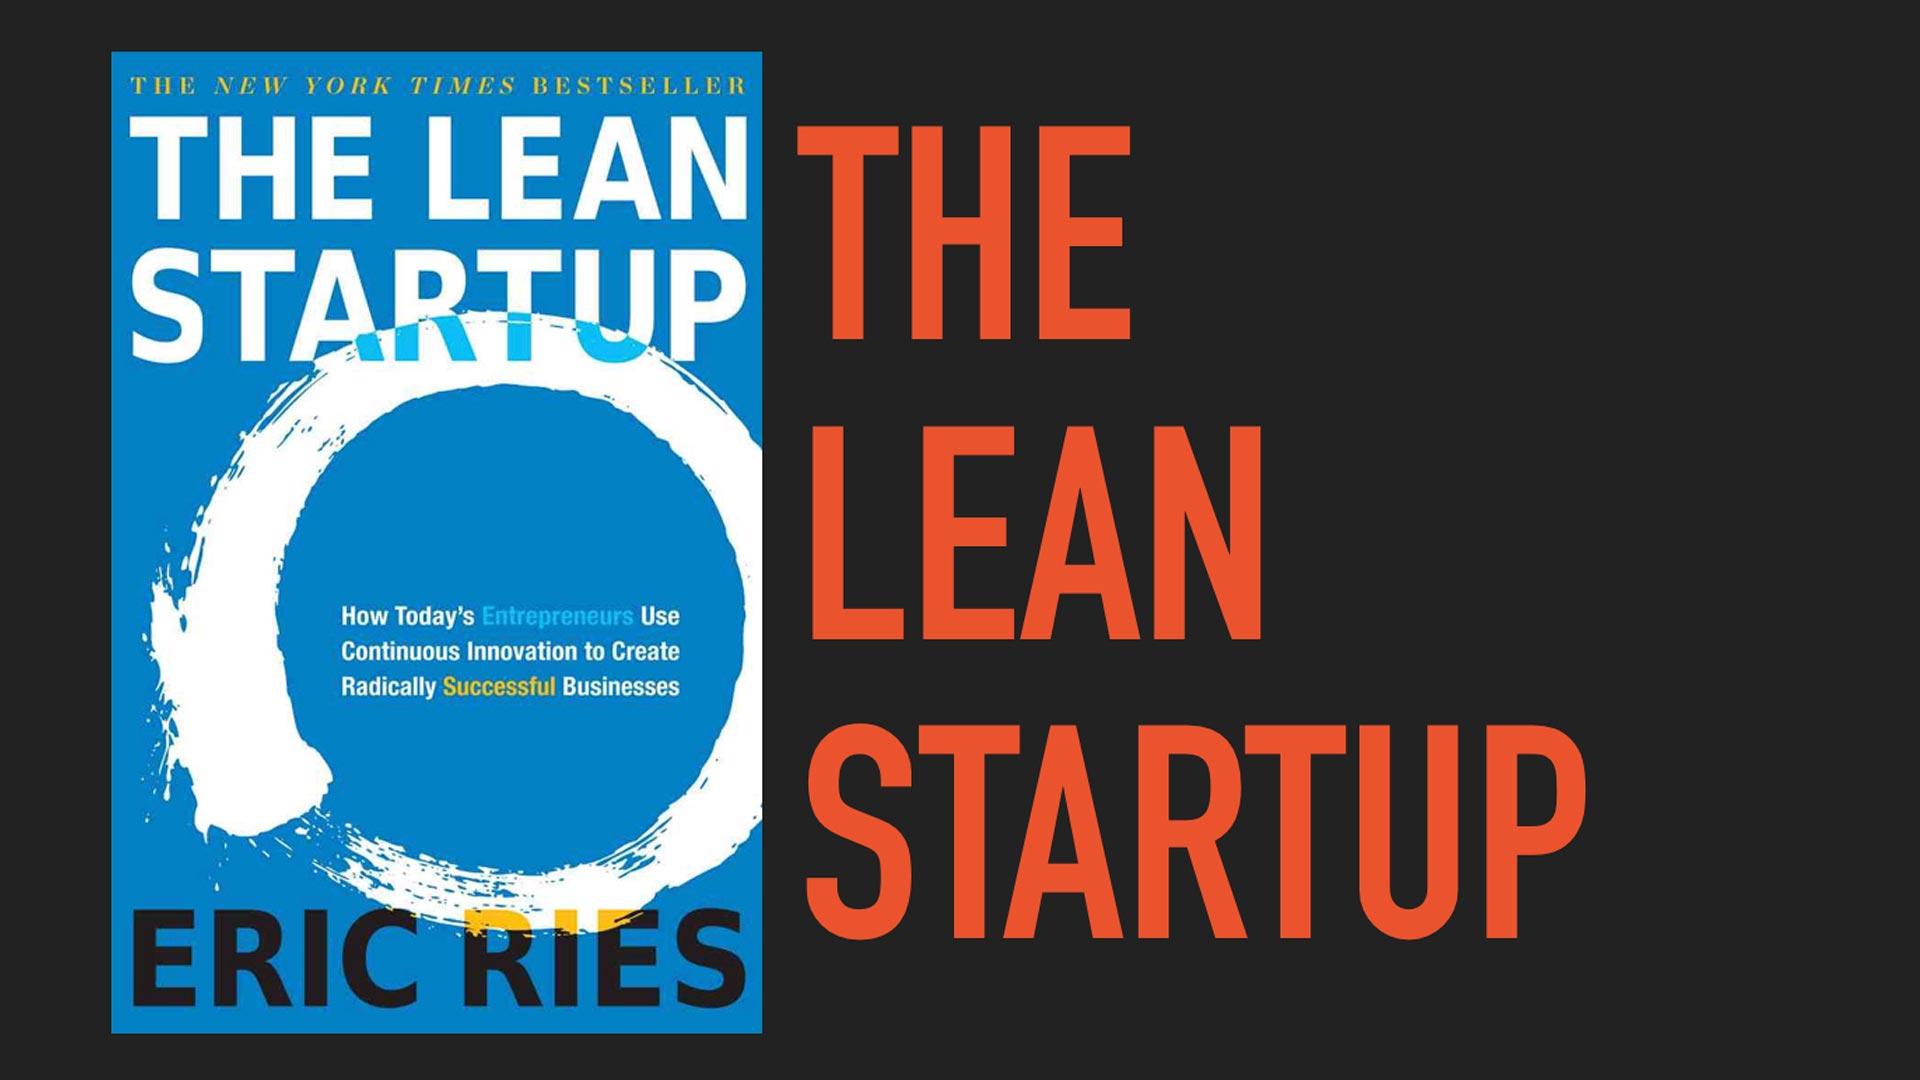 Entrepreneurialism: Taking the Leap by Misha Tenenbaum